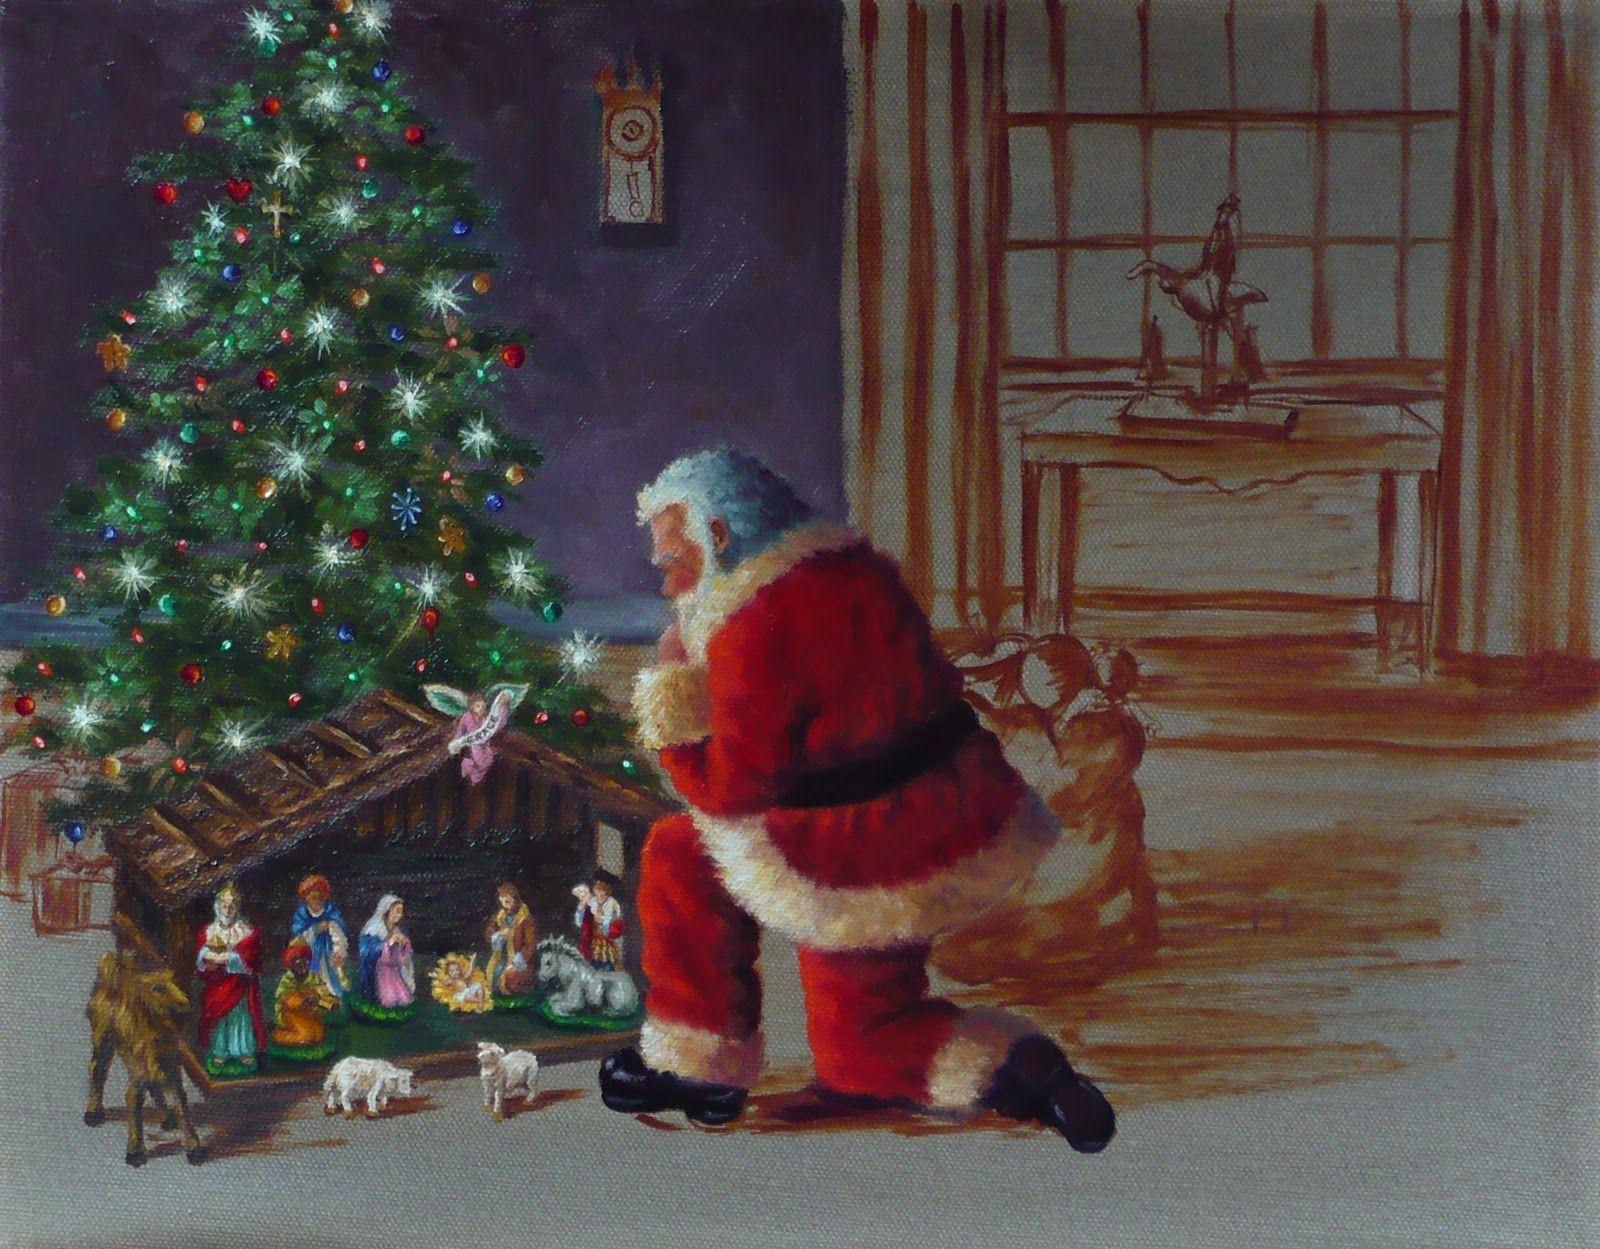 Santa Christmas Tree Santa Claus Nativity Painting Decorating The Christmas Tree Nativity Painting Christmas Scenes Santa Art